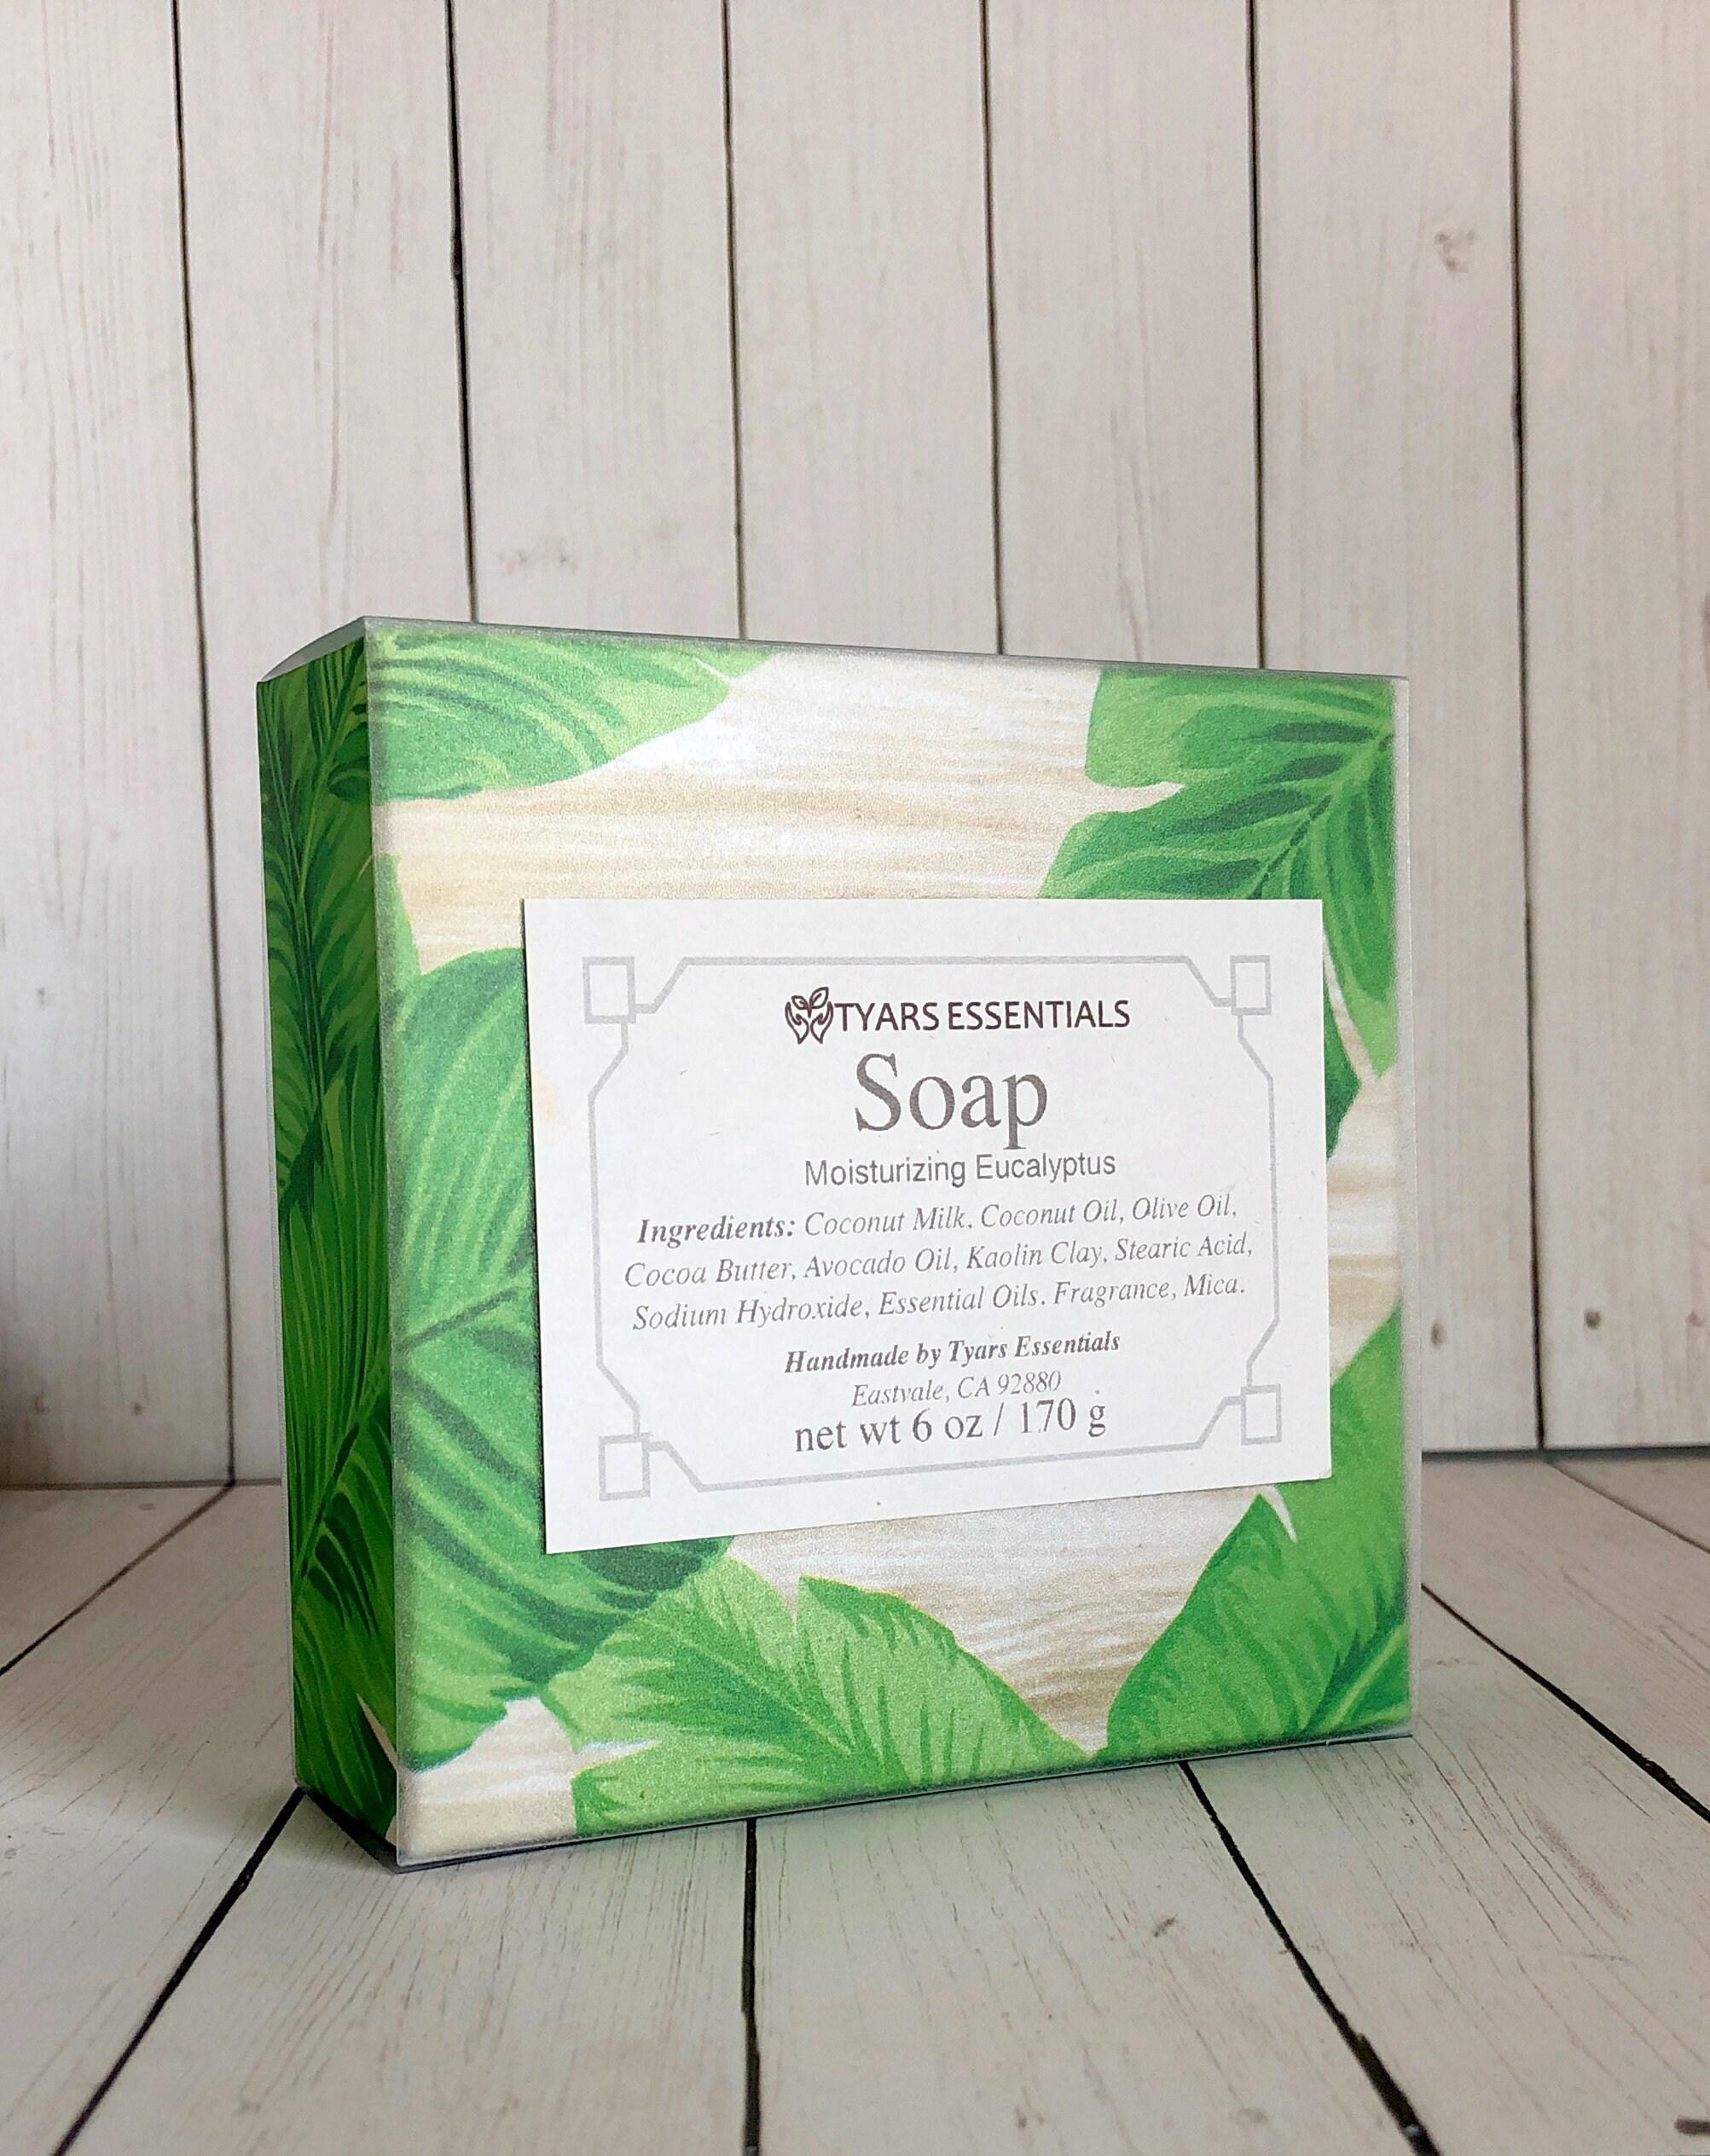 Square Soap Box Decor Cricut Template Or Hand Cutting Guide Etsy